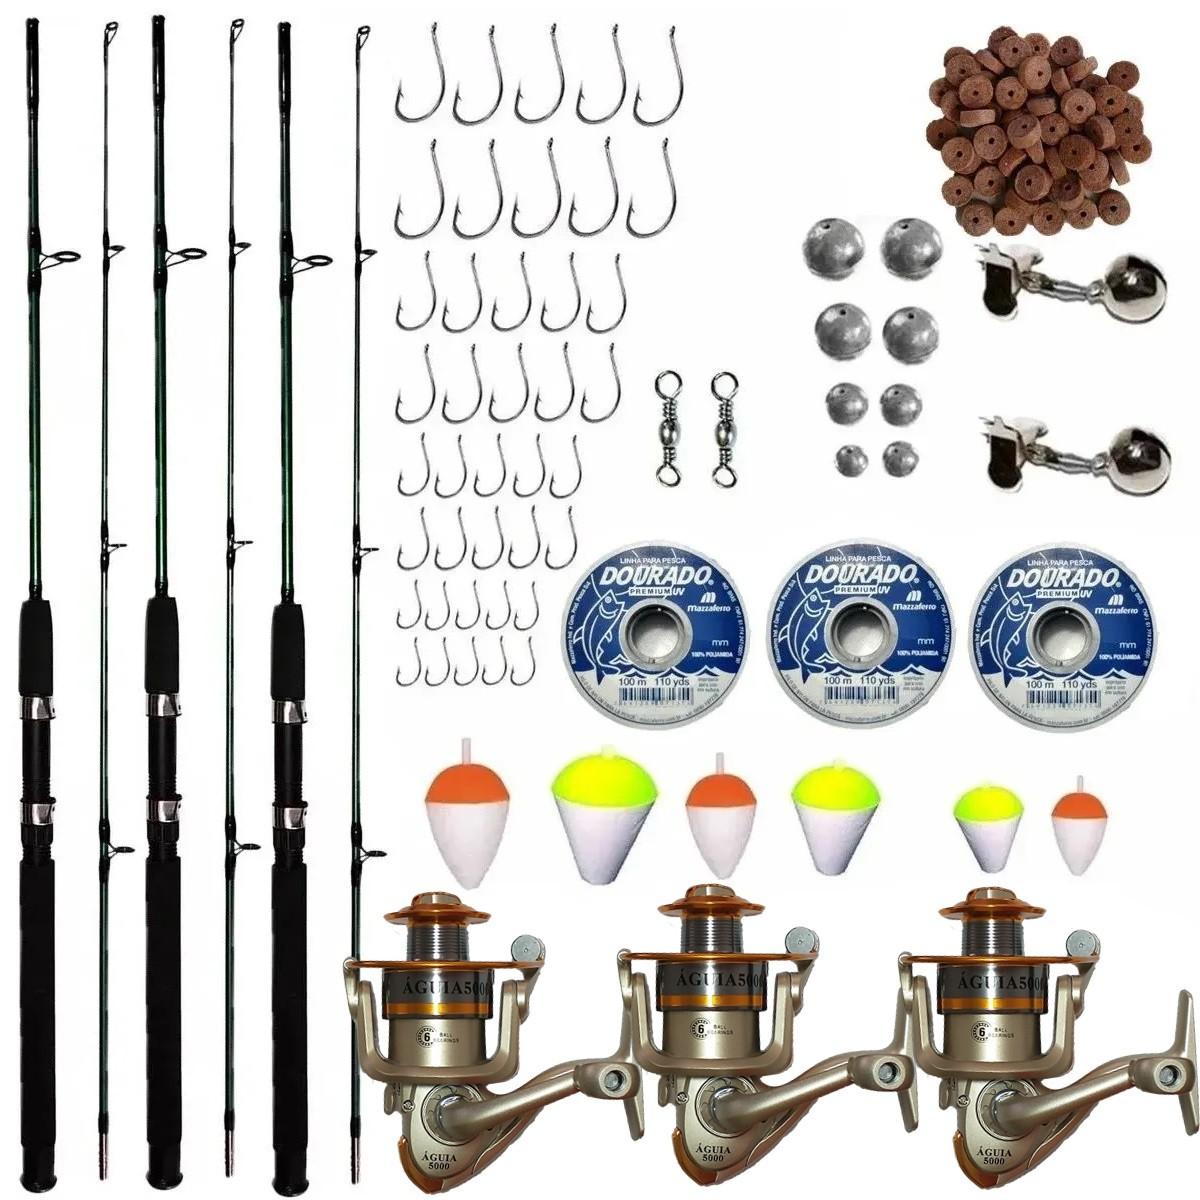 Kit De Pesca Completo 20kg 3 Vara 1,70 3 Molinete + Itens